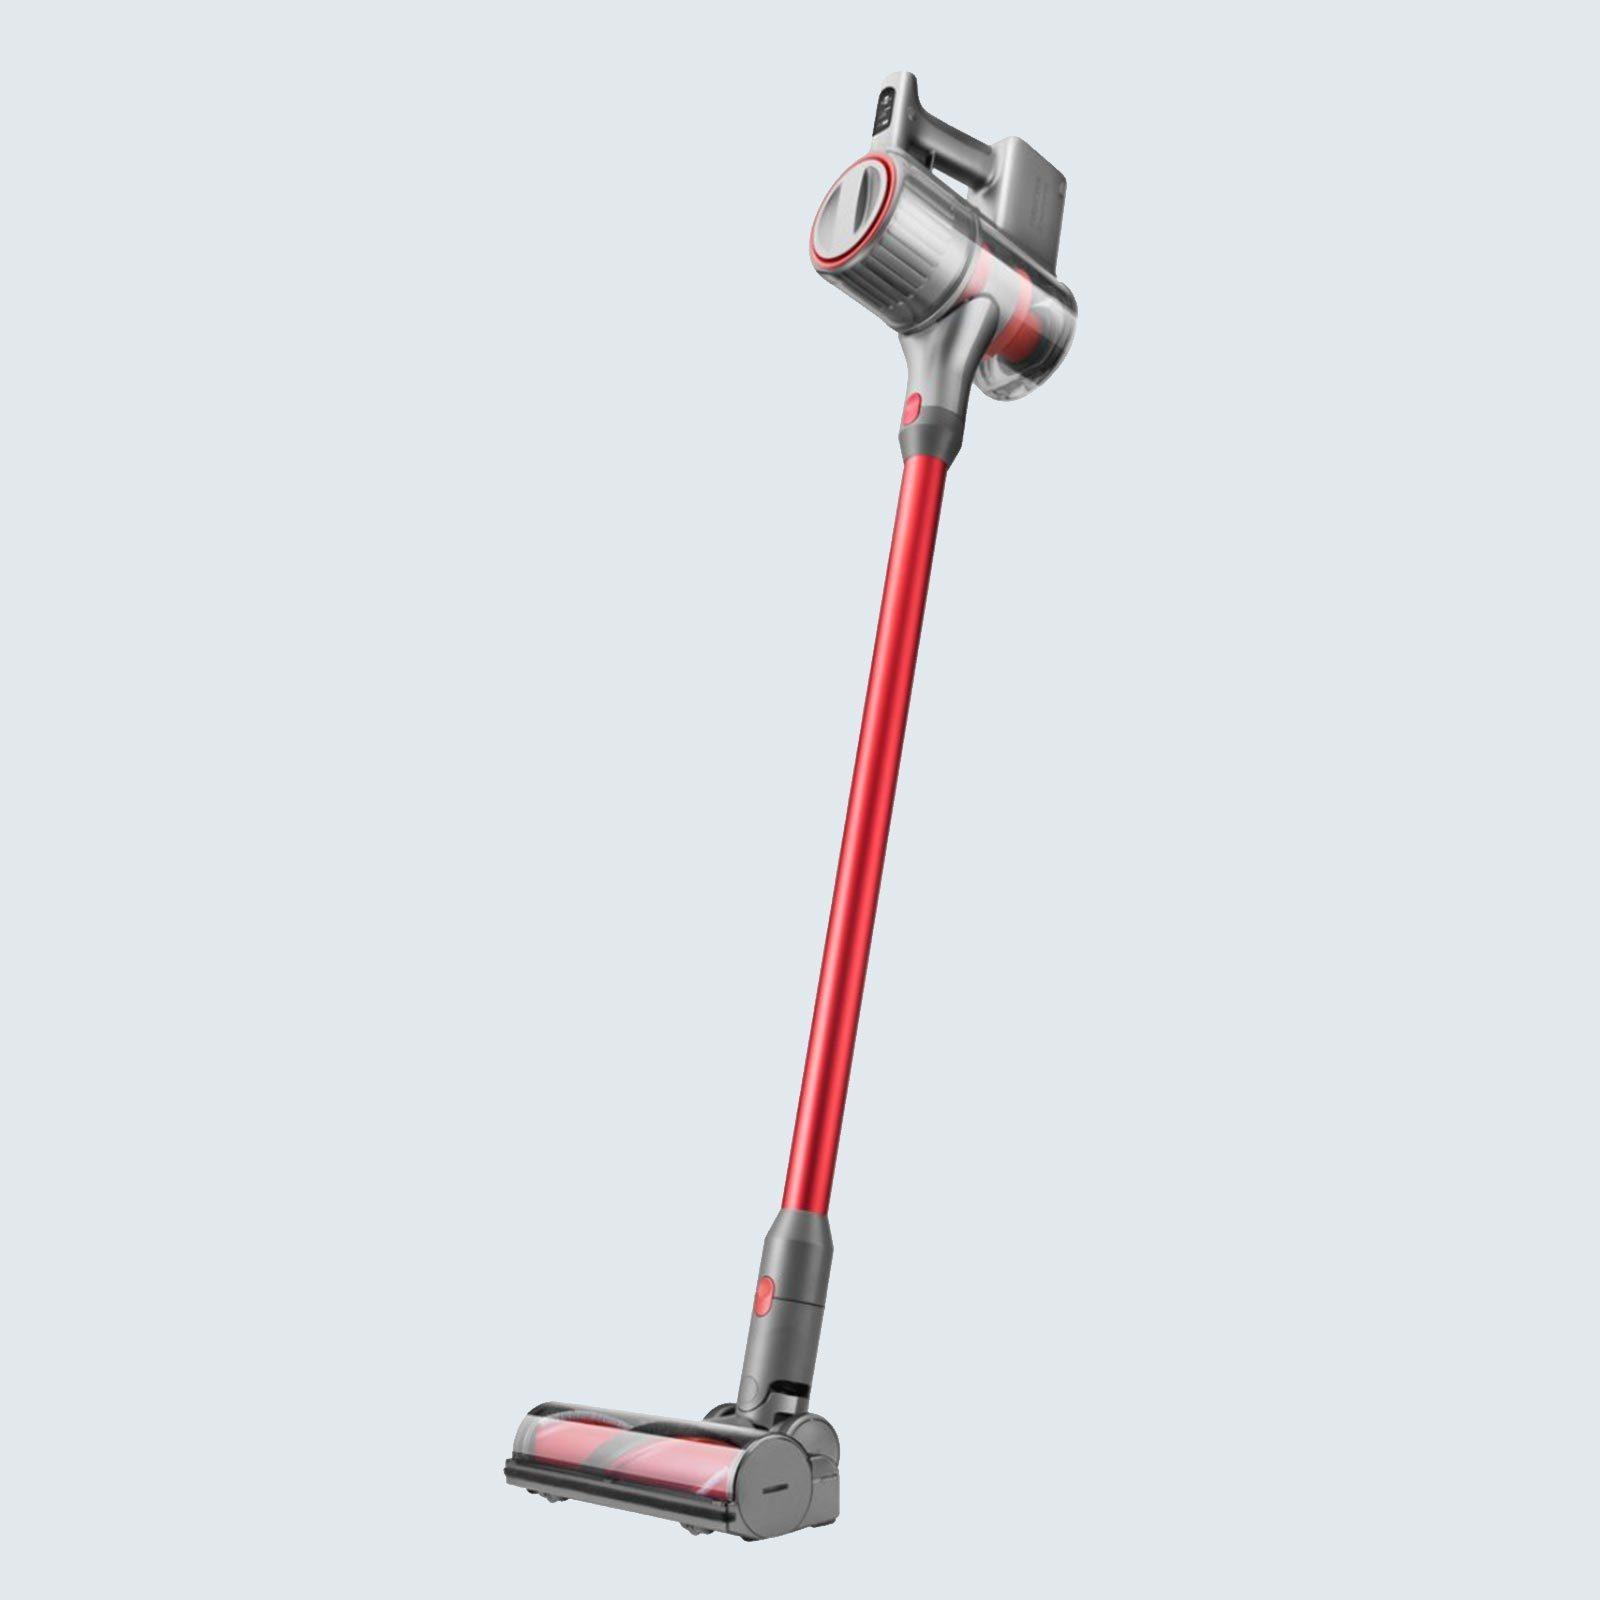 Roborock H6 Cordless Stick Vacuum